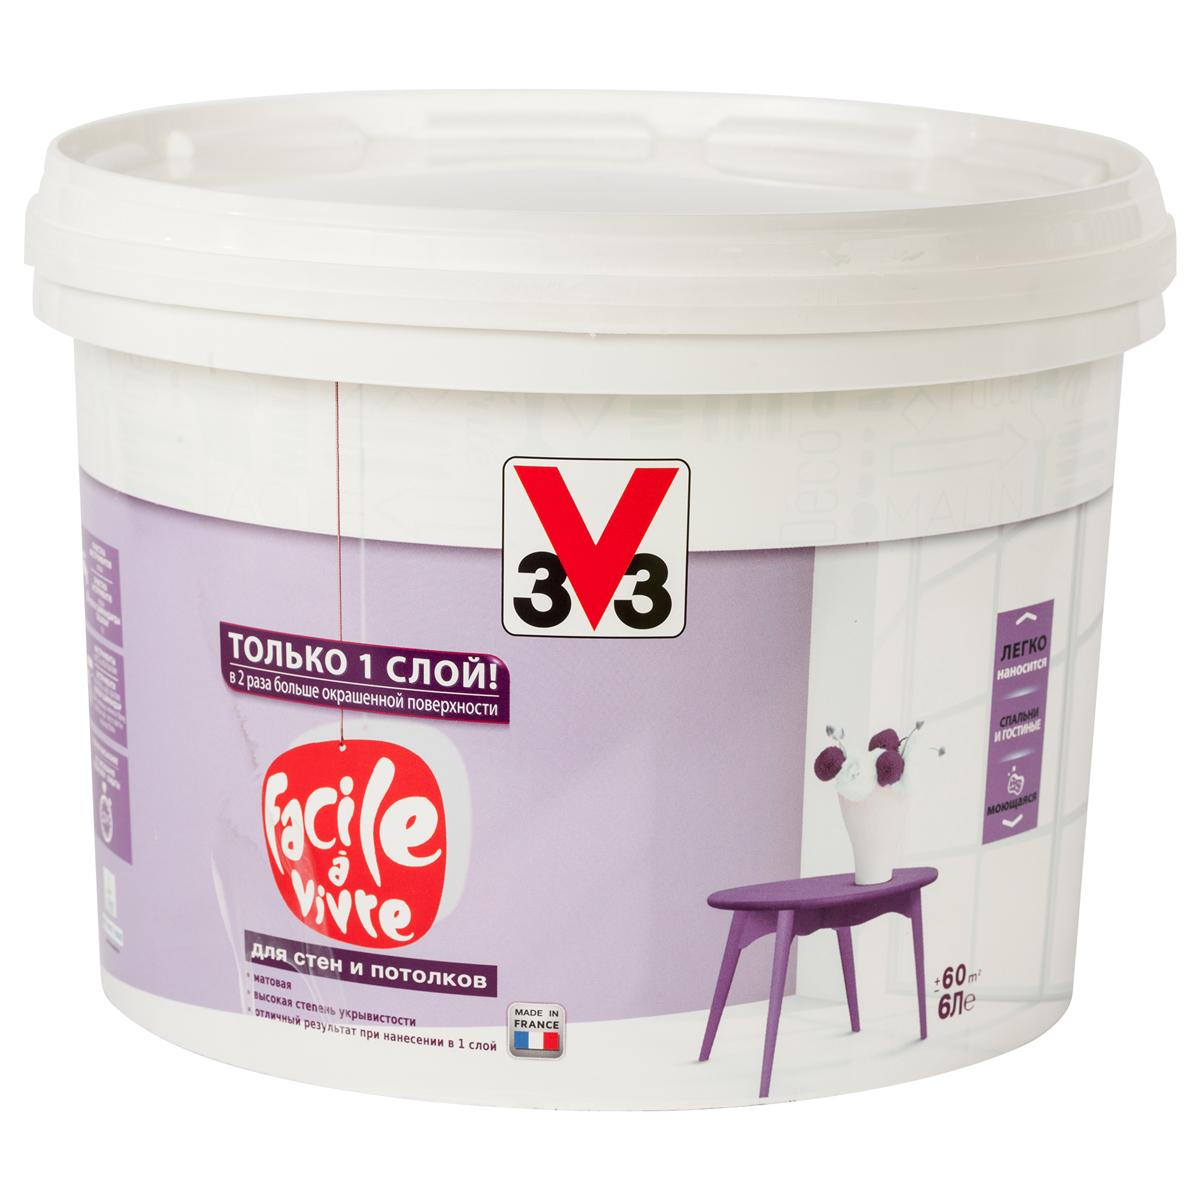 "Краска для стен и потолков V33 ""Facile A Vivre"", 6 л 106872"